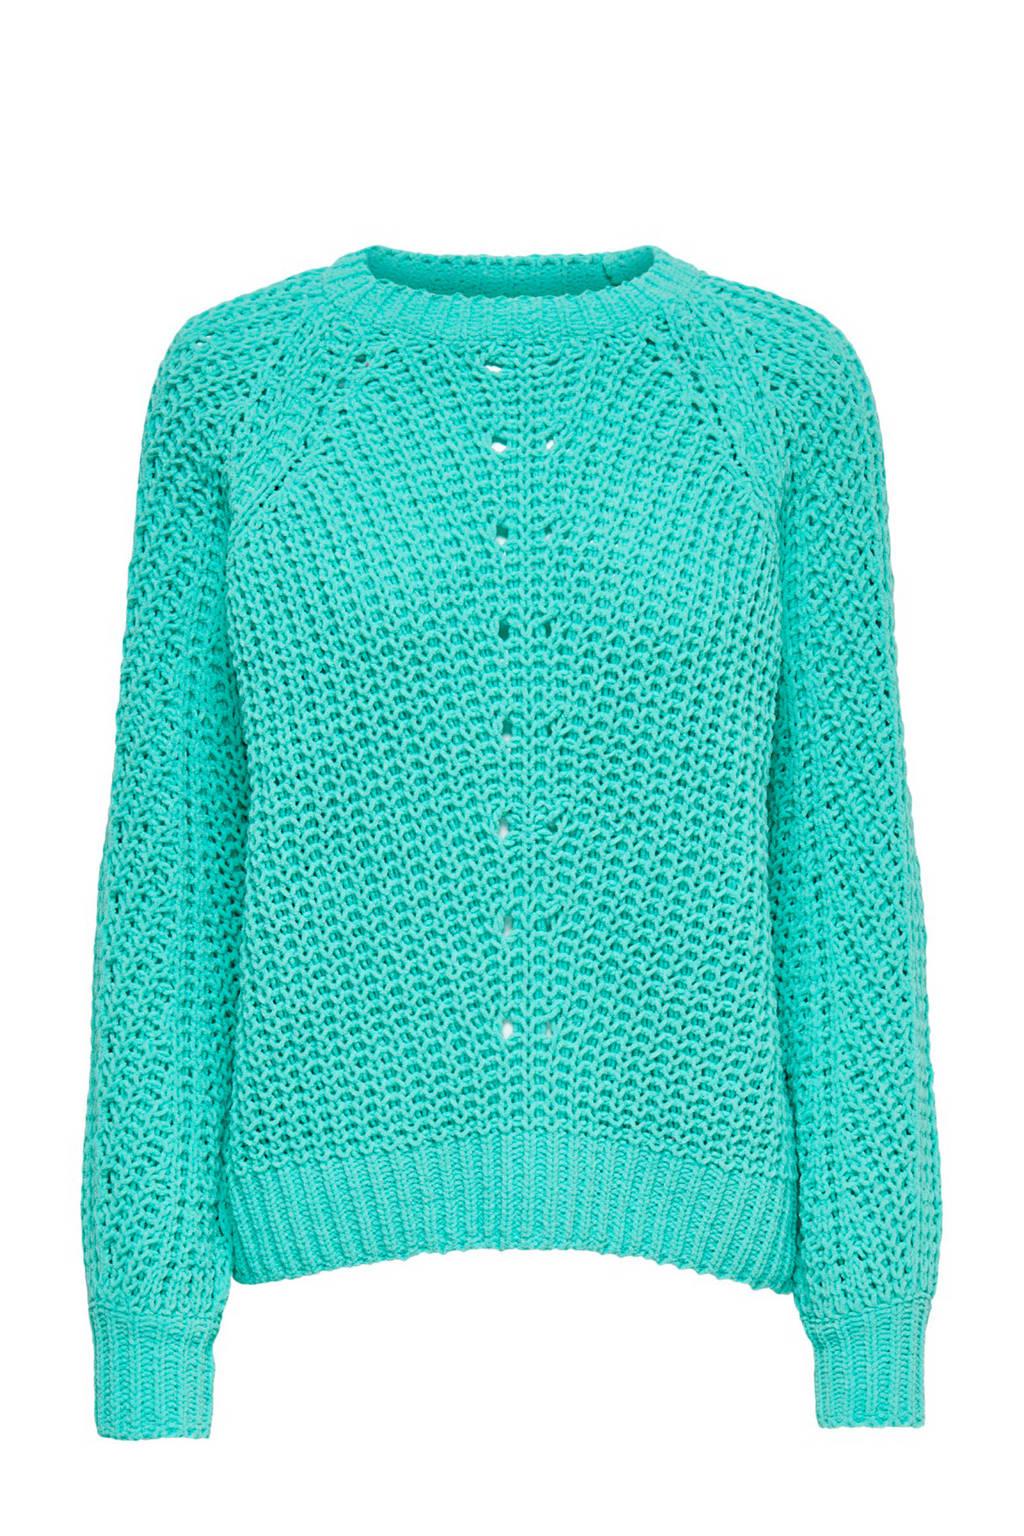 ONLY zacht gebreide trui, Groen